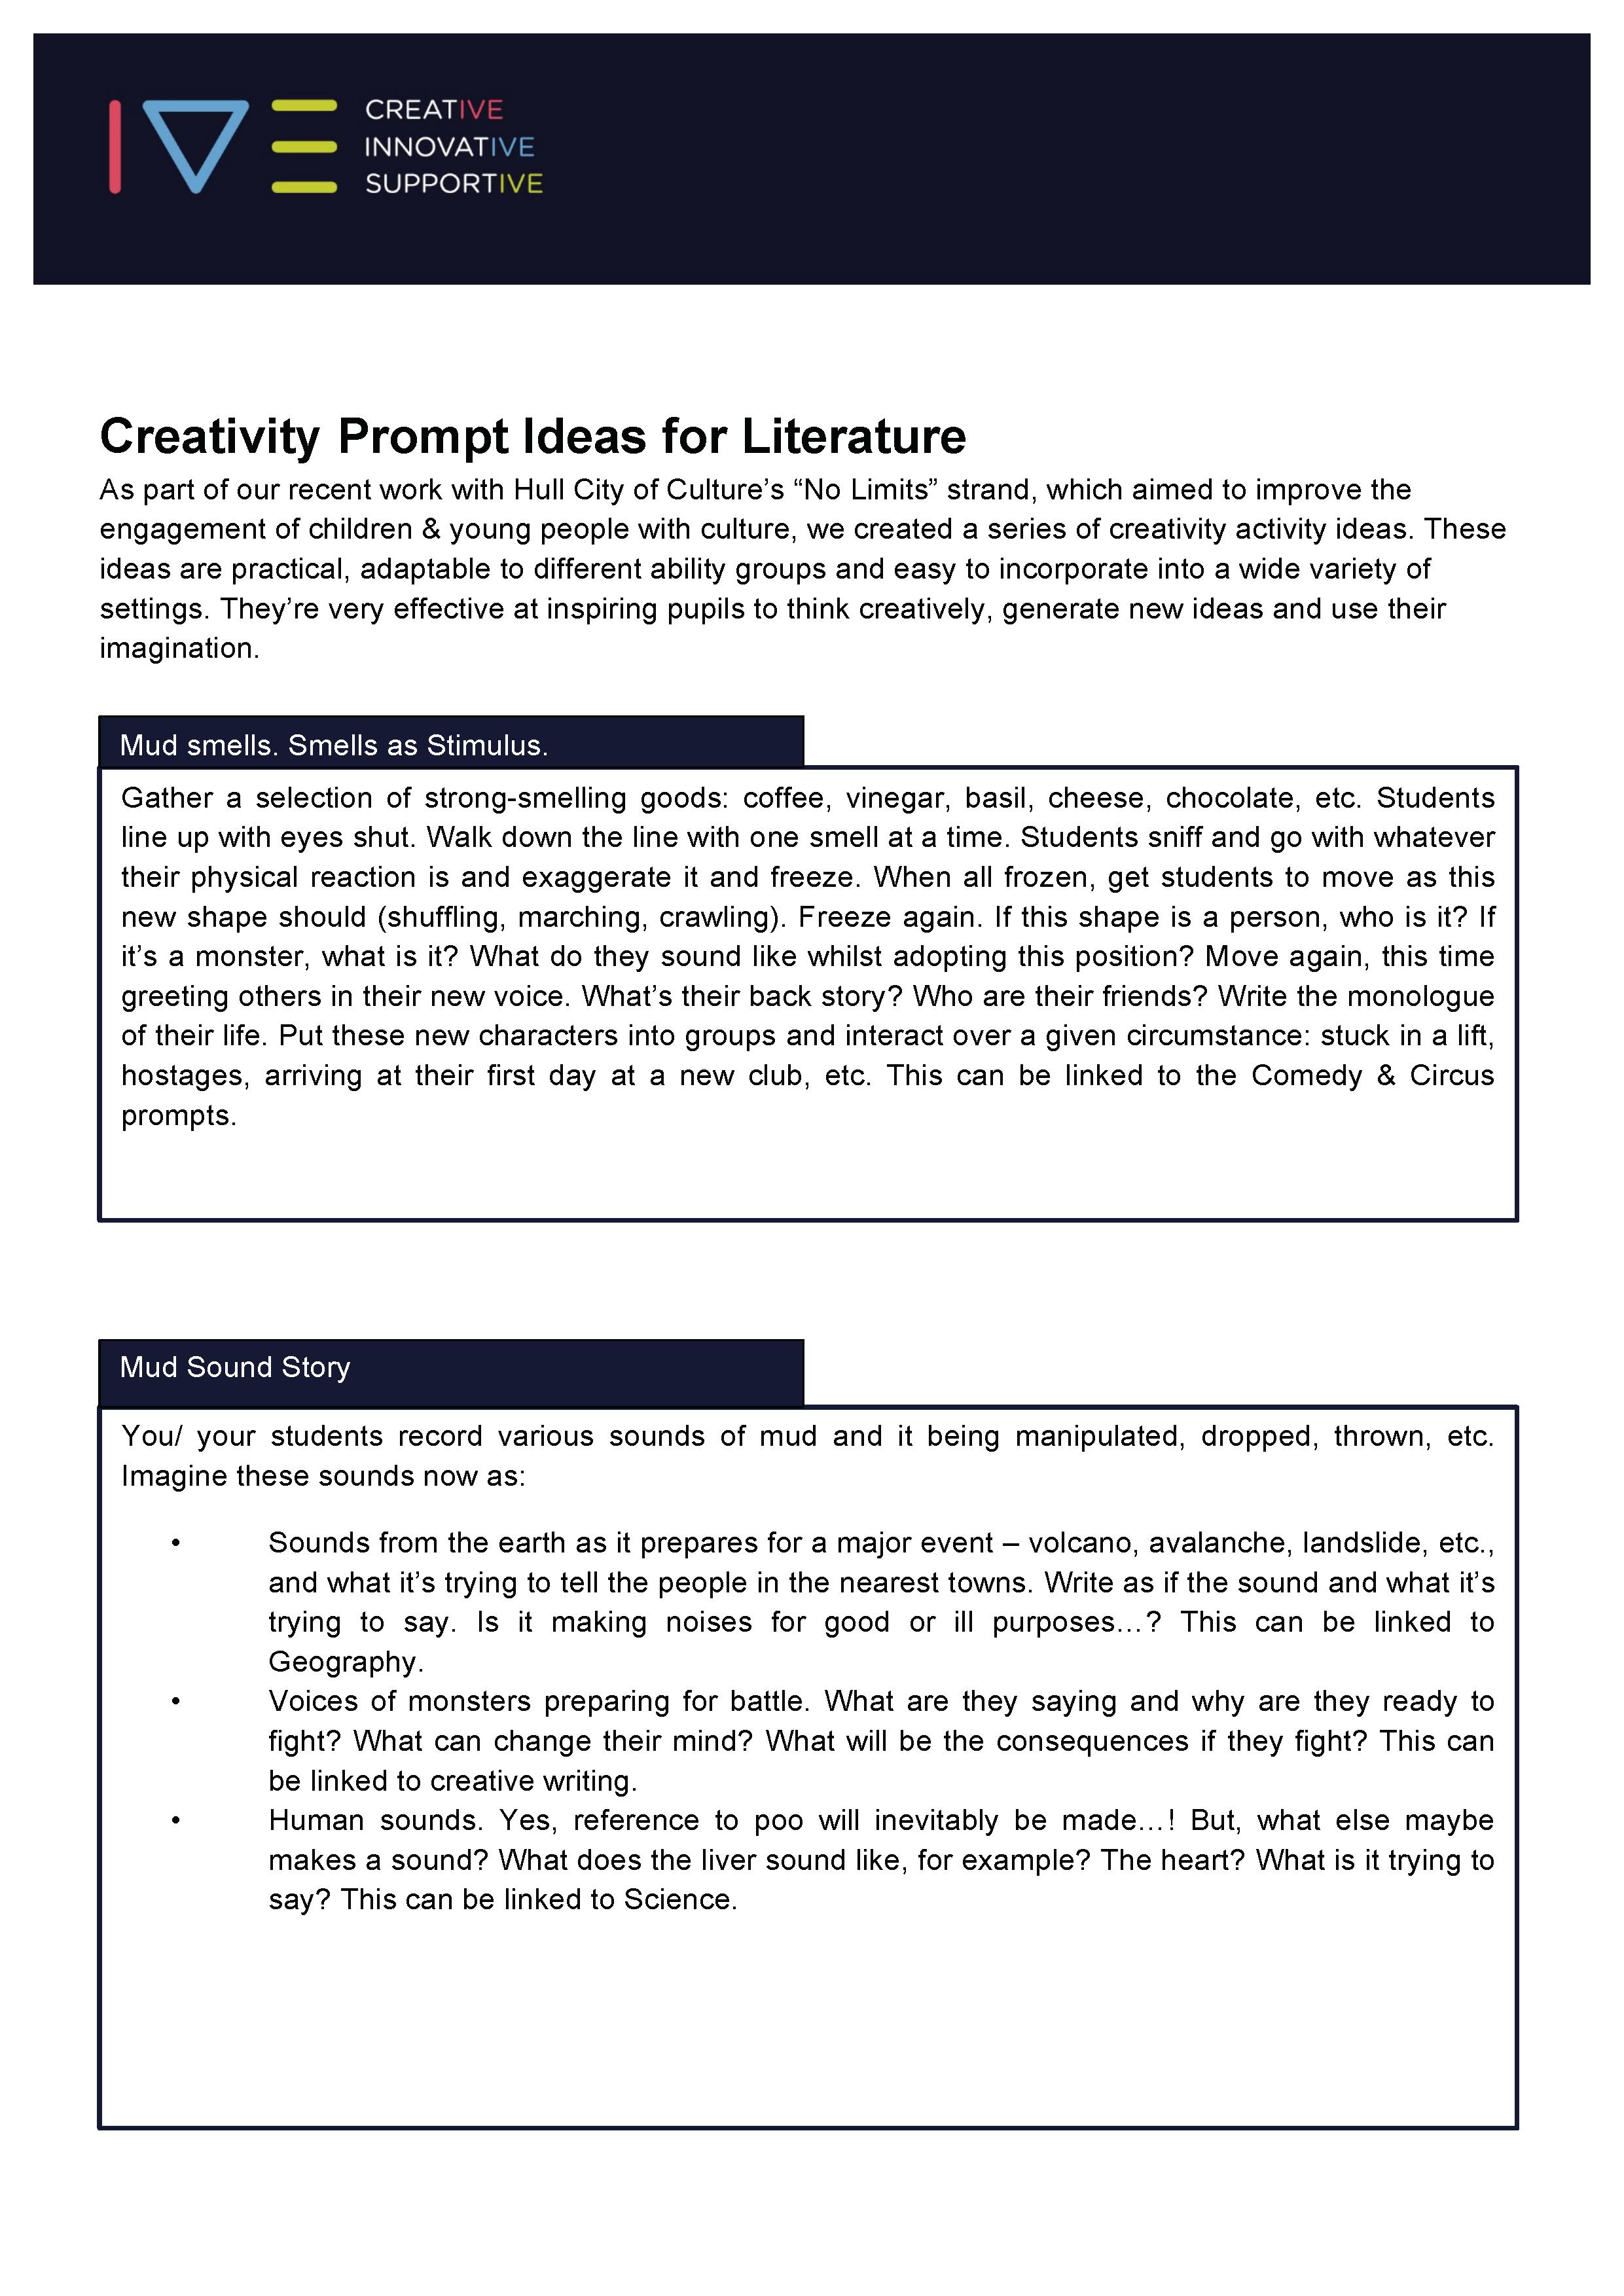 Creativity Prompt Ideas for Literature